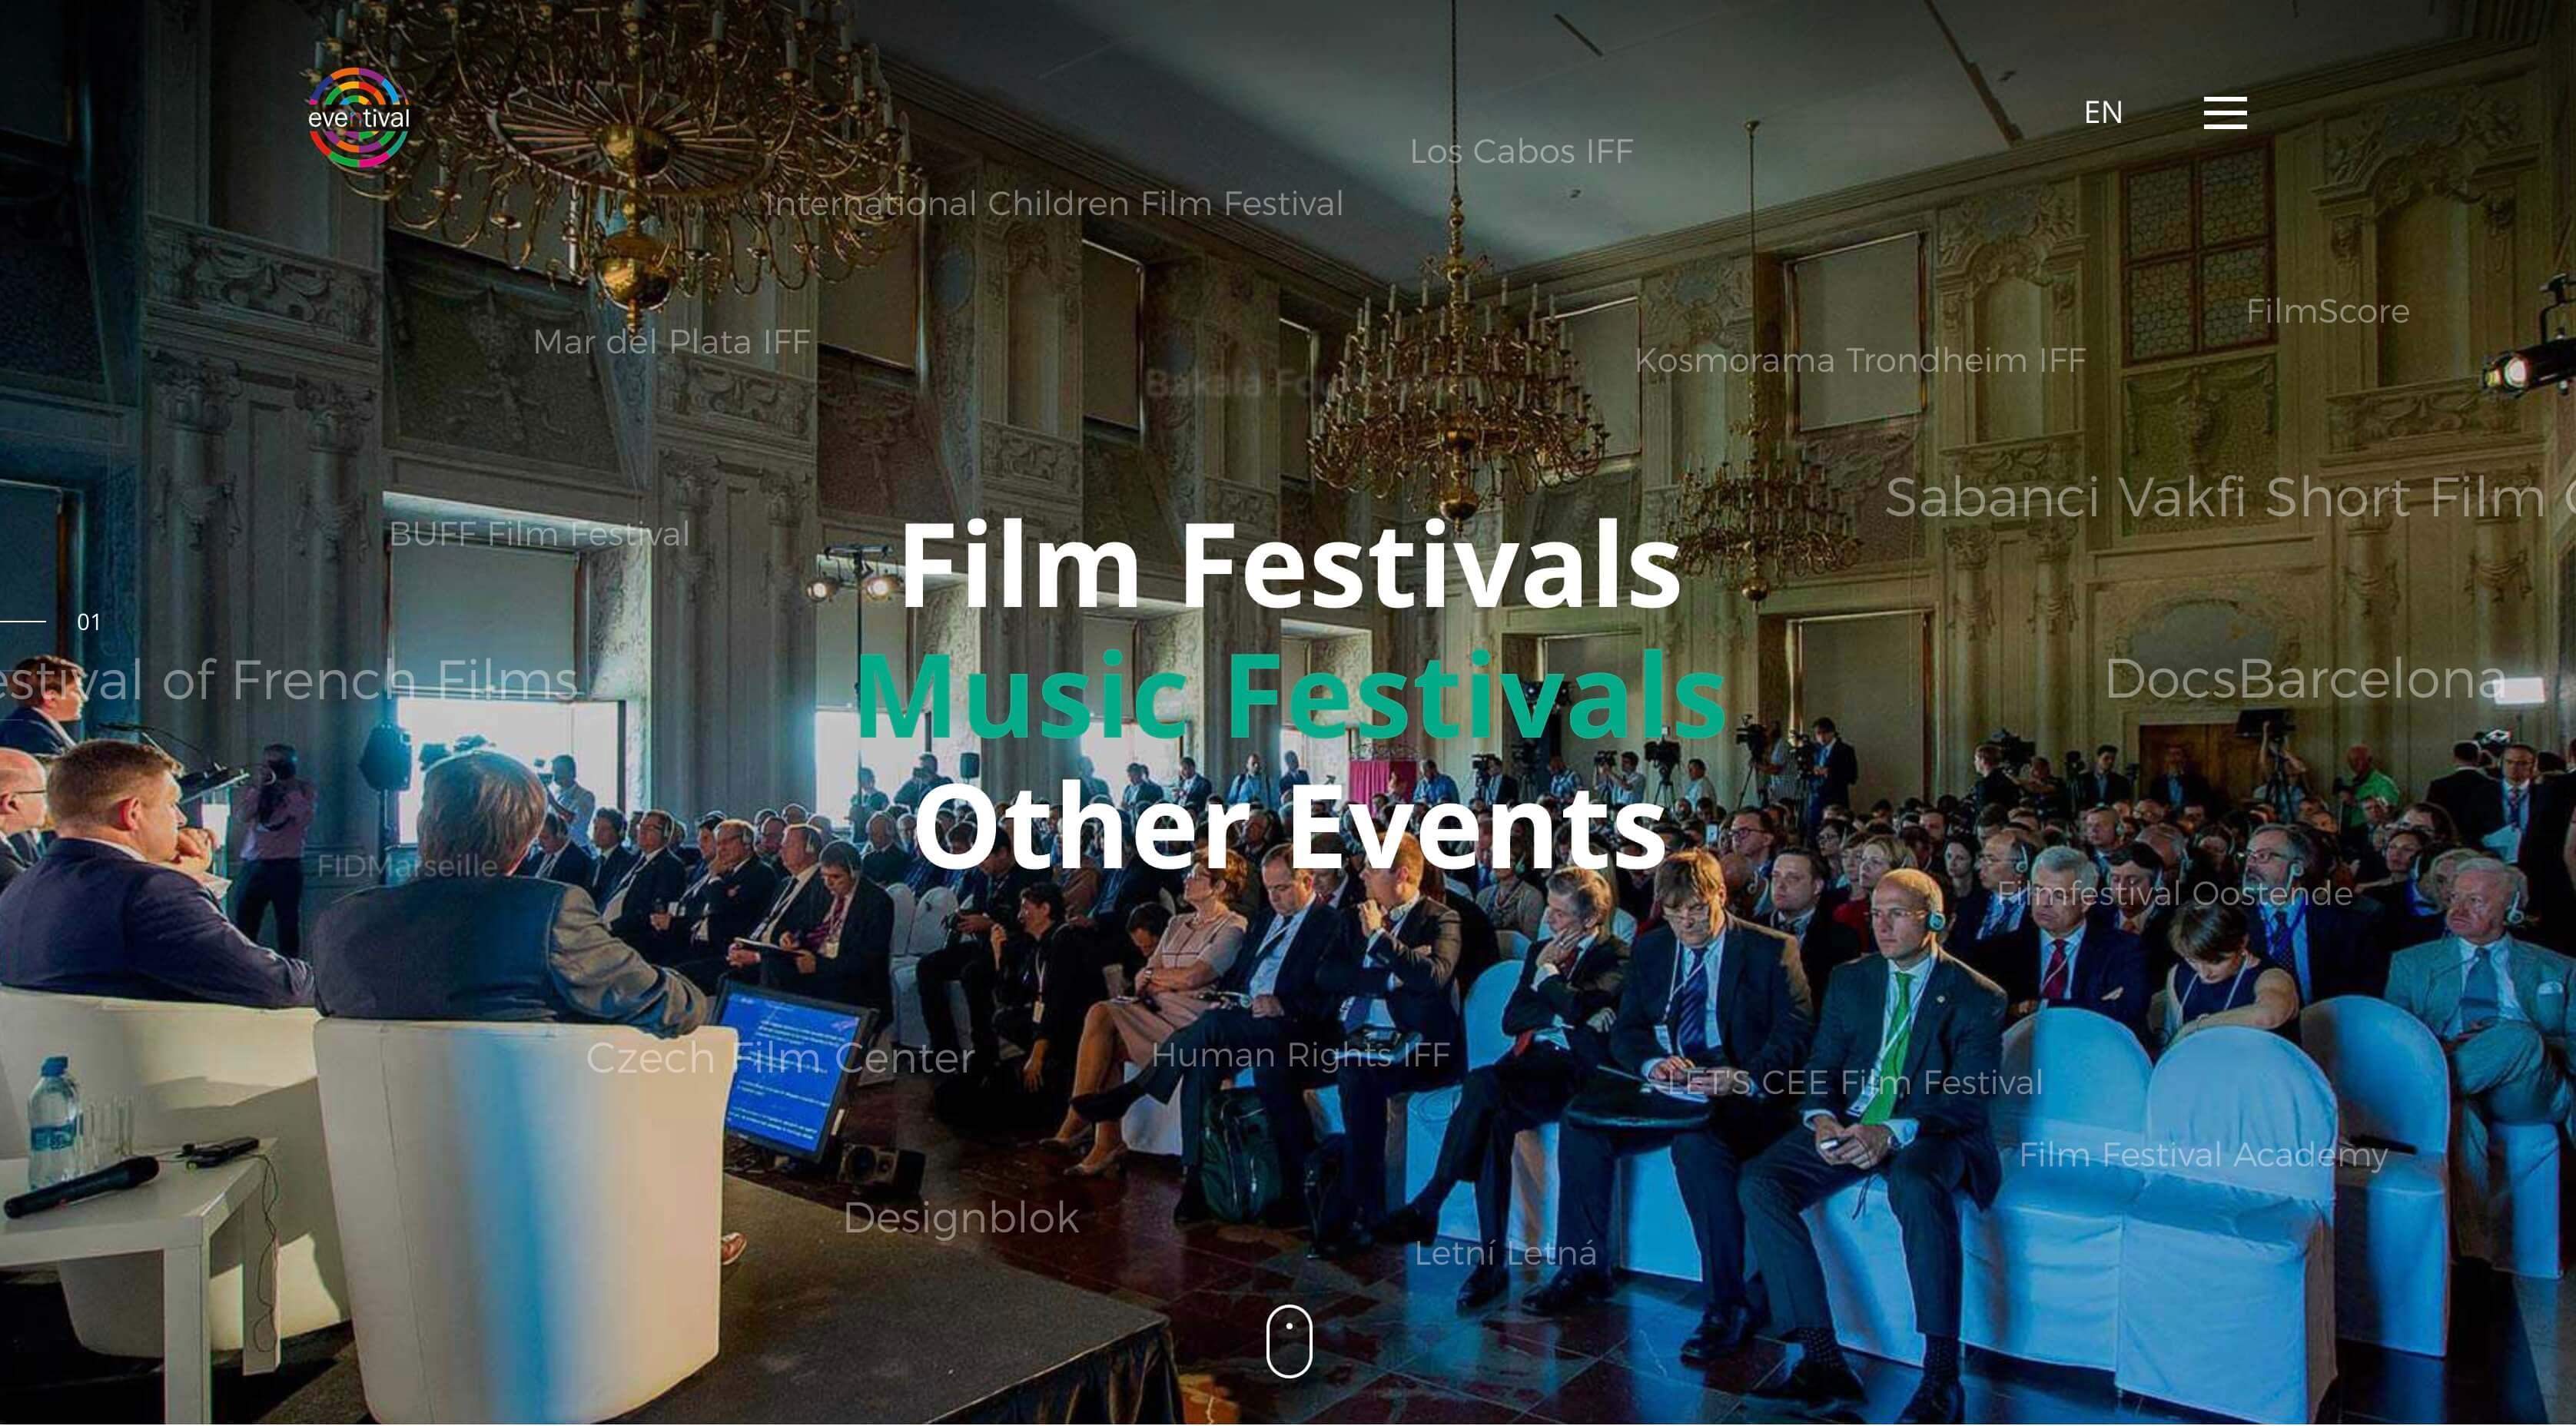 event planning software for festivals